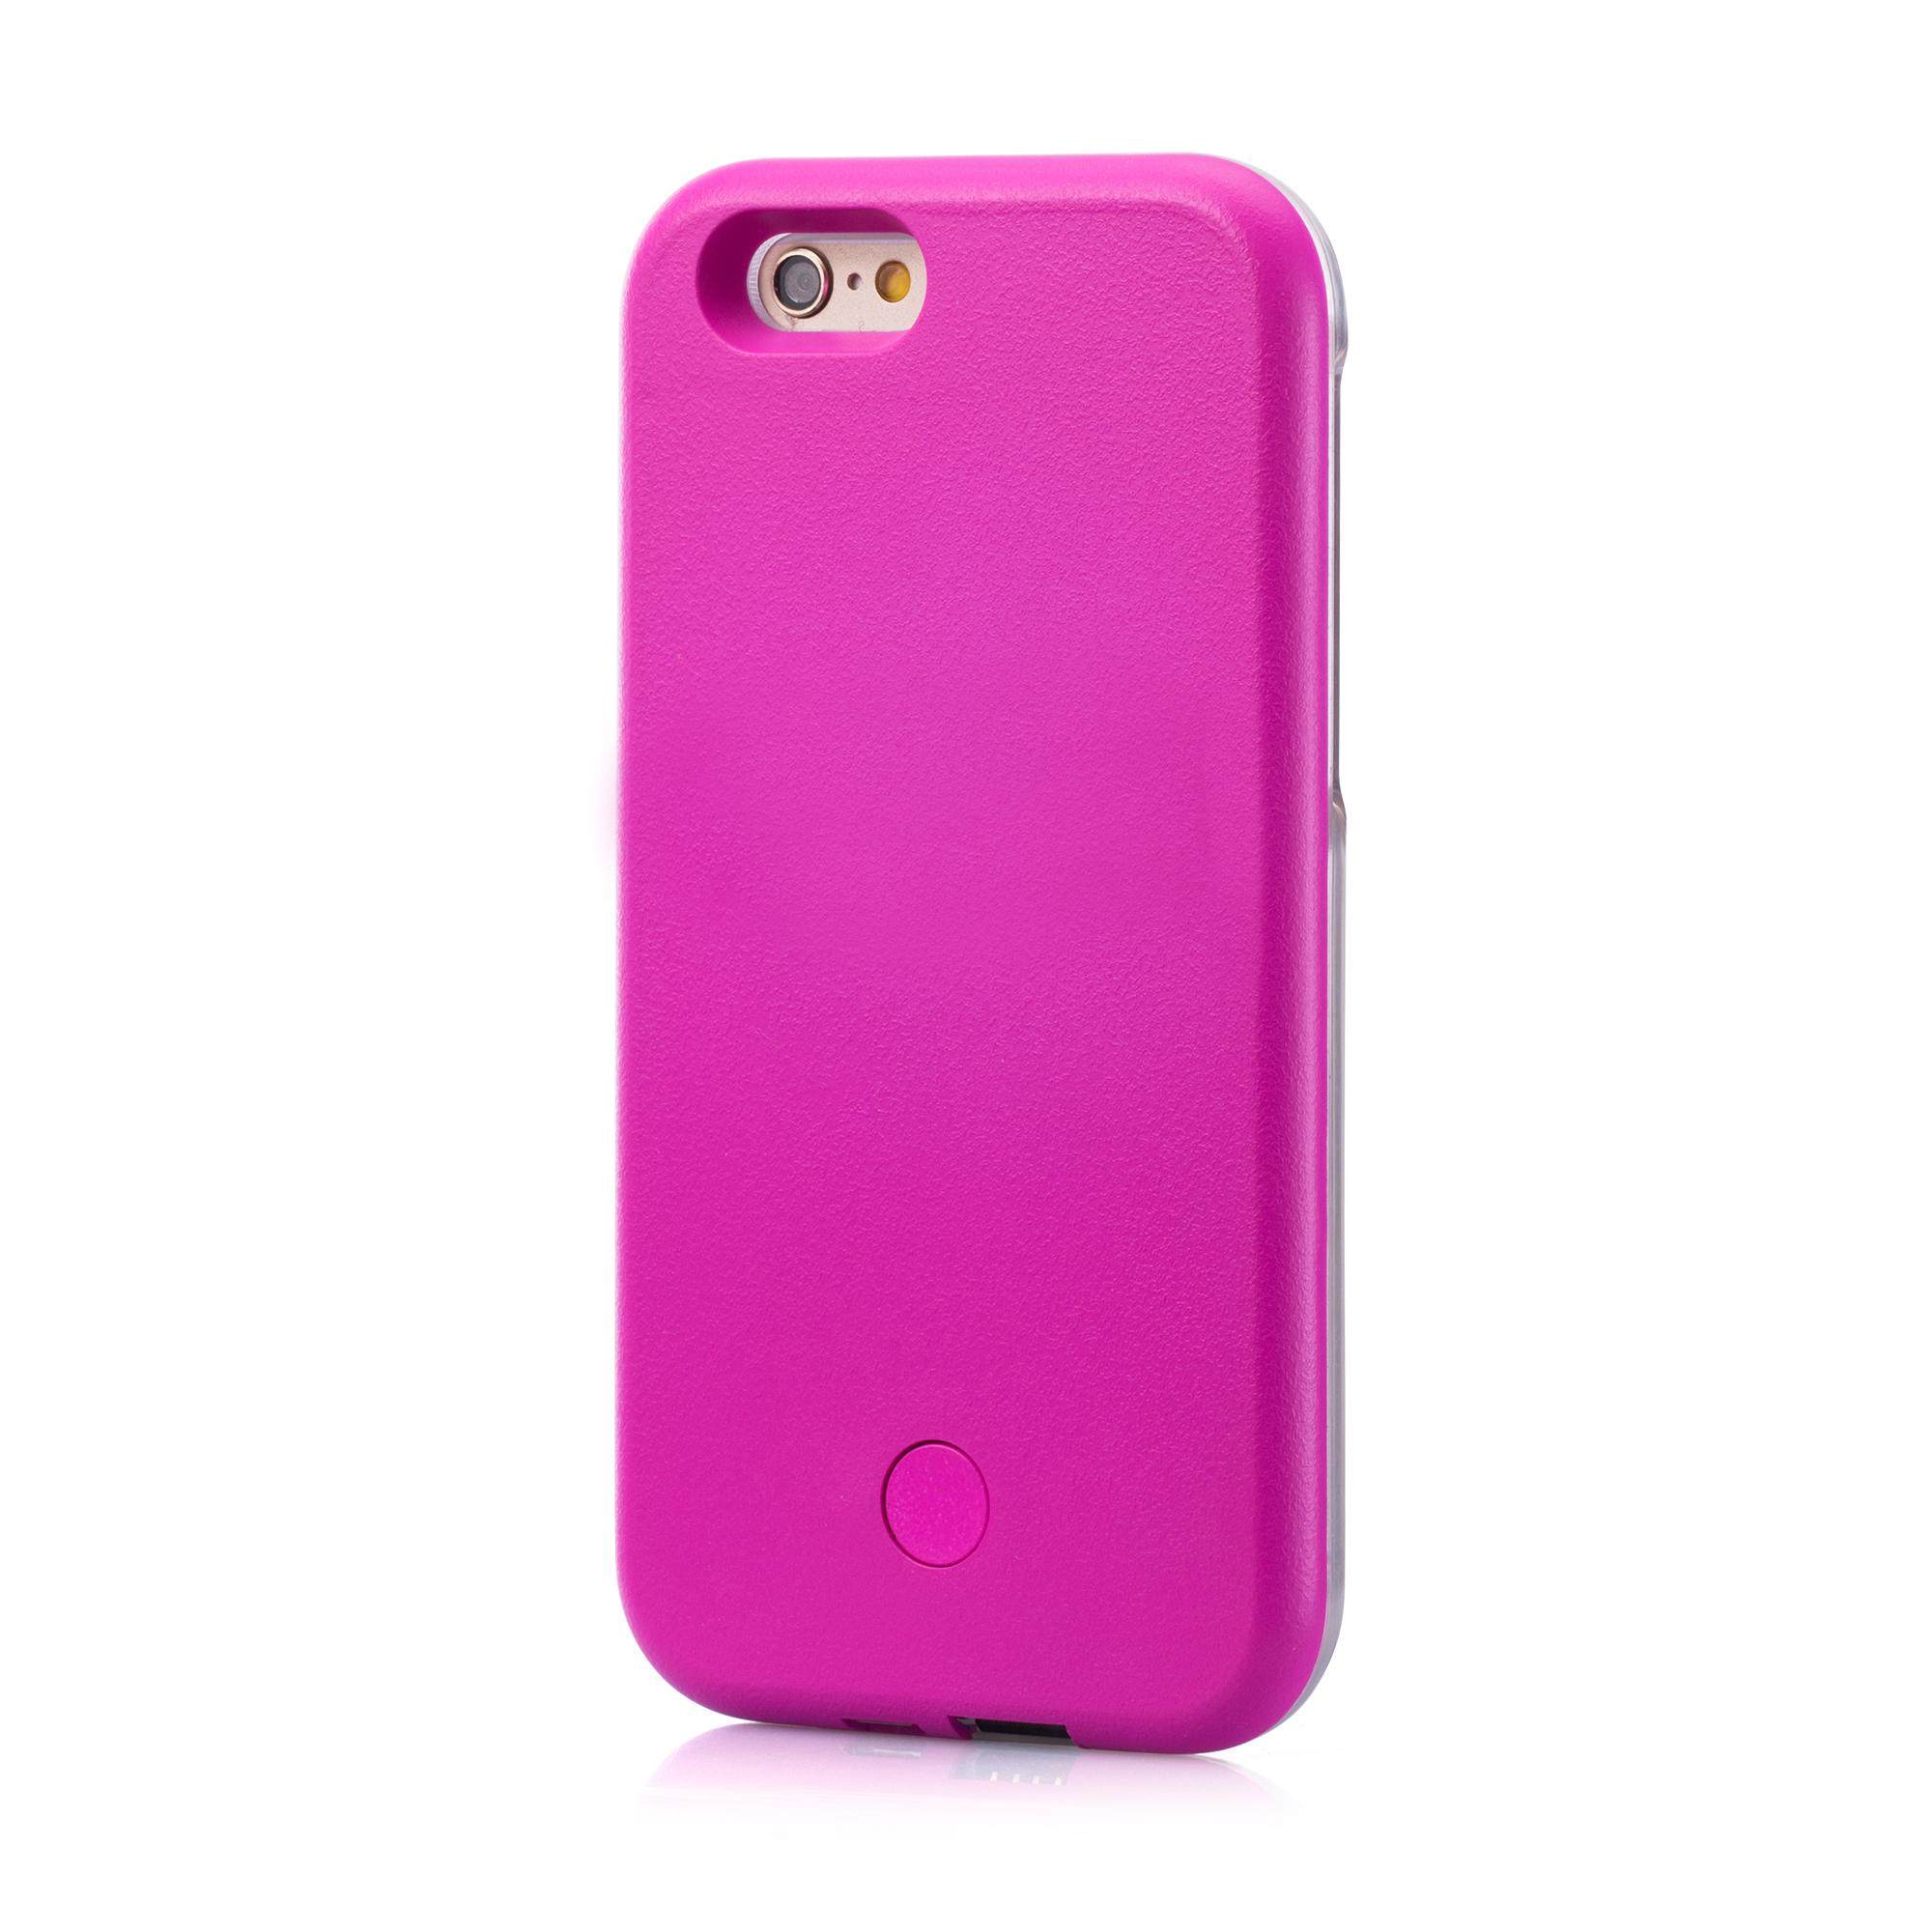 Vapiao Selfie Case Pink Apple Iphone 5 5s Se 6 6s Plus Led In 3 1